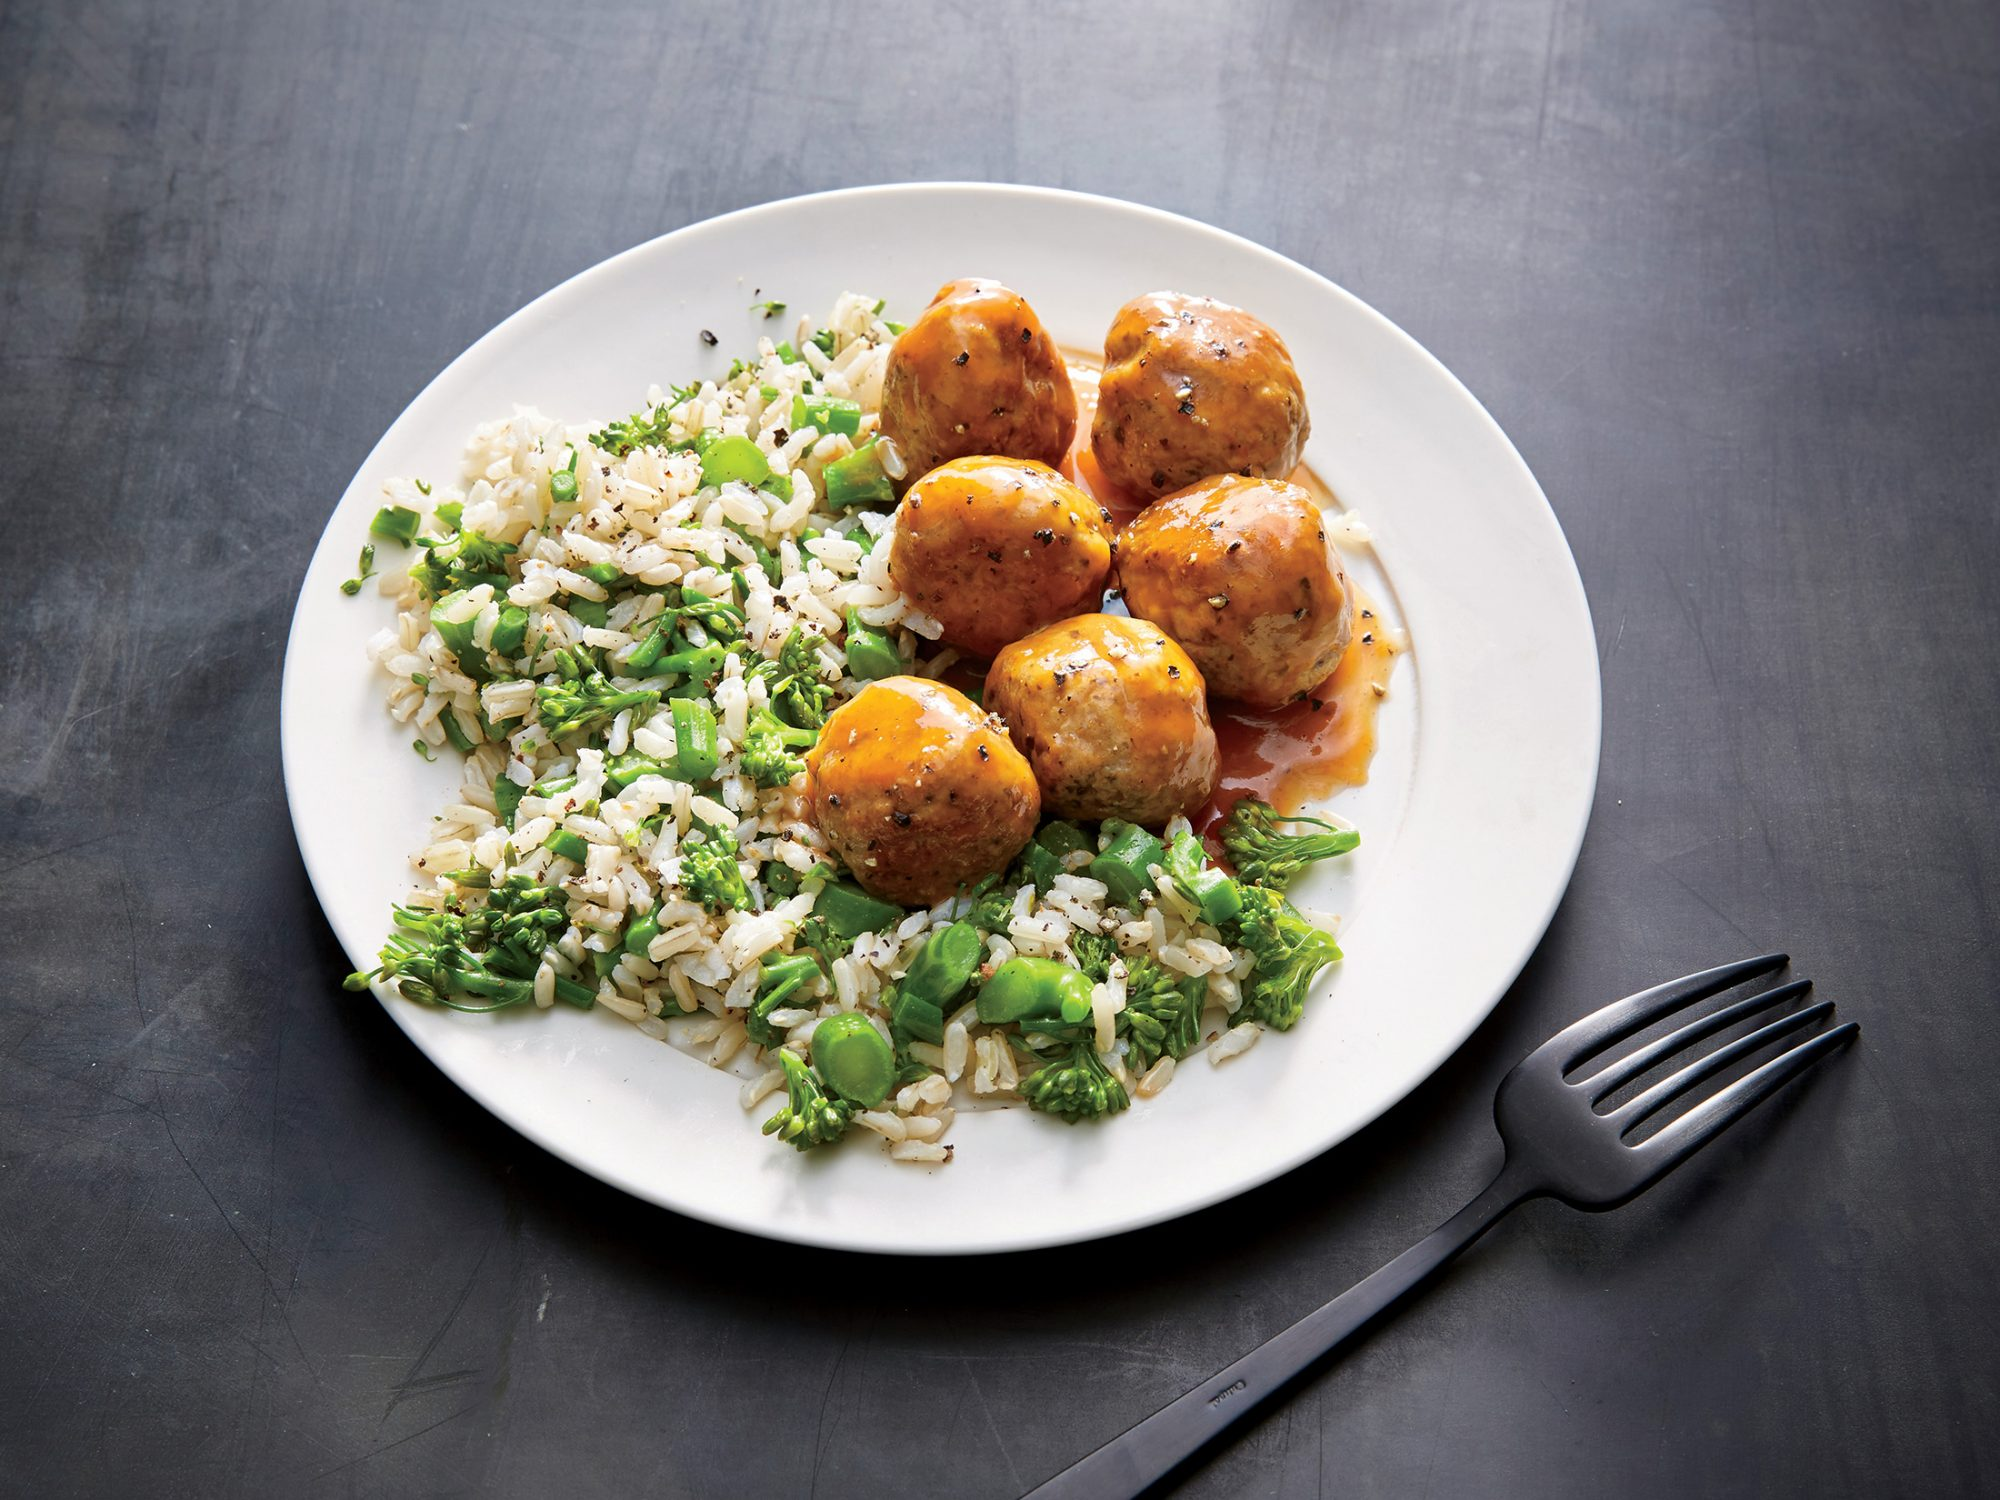 Mushroom and Pork Meatballs with Broccolini Rice